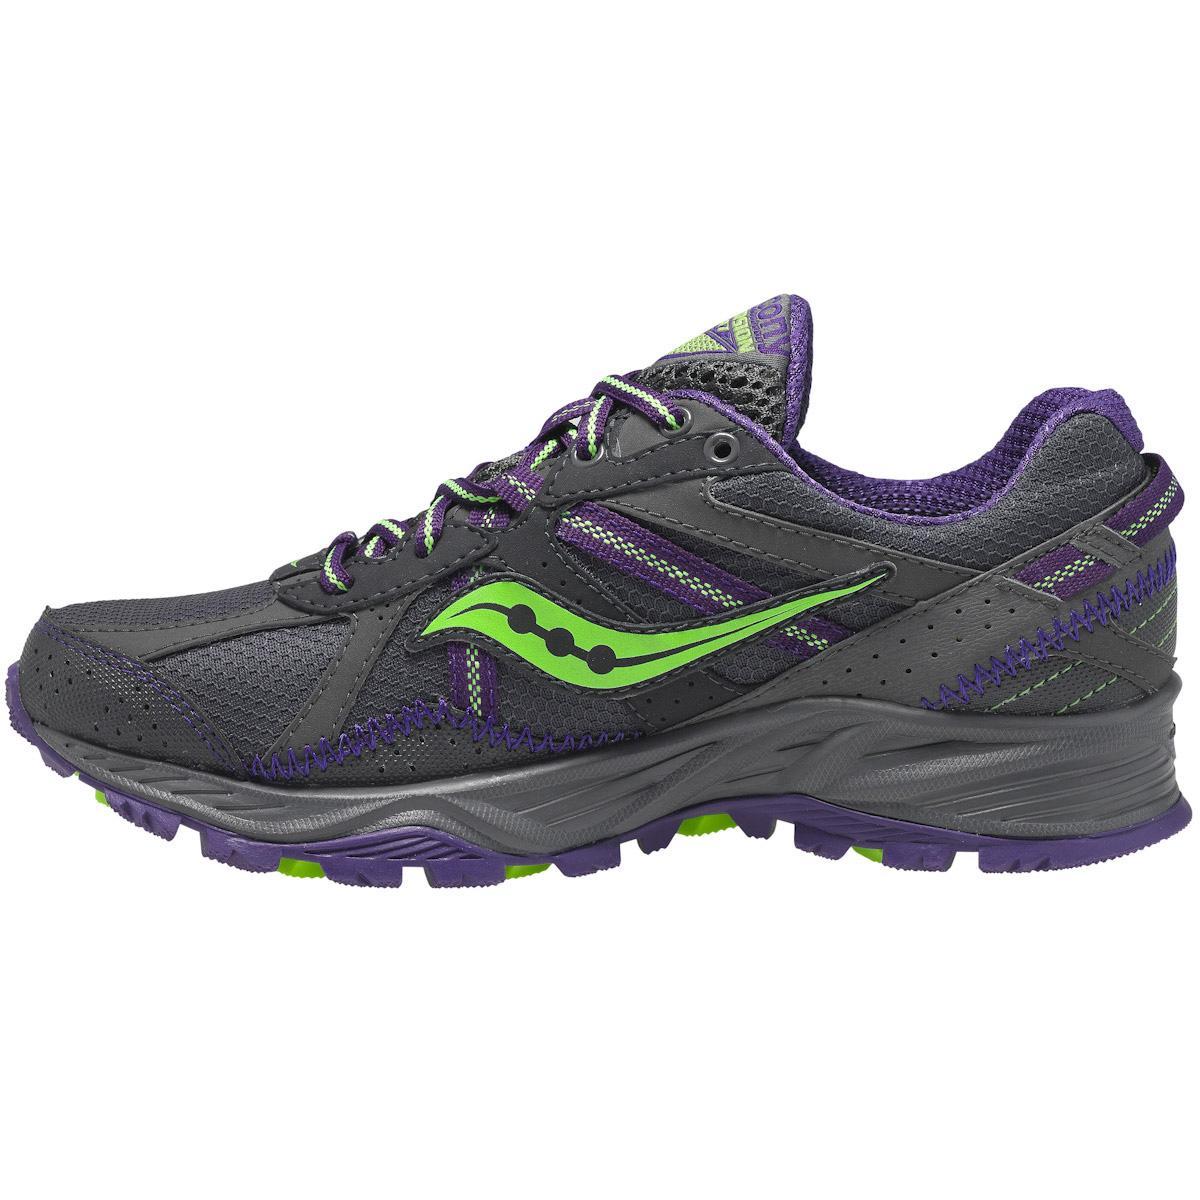 Saucony Excursion Tr Womens Shoes